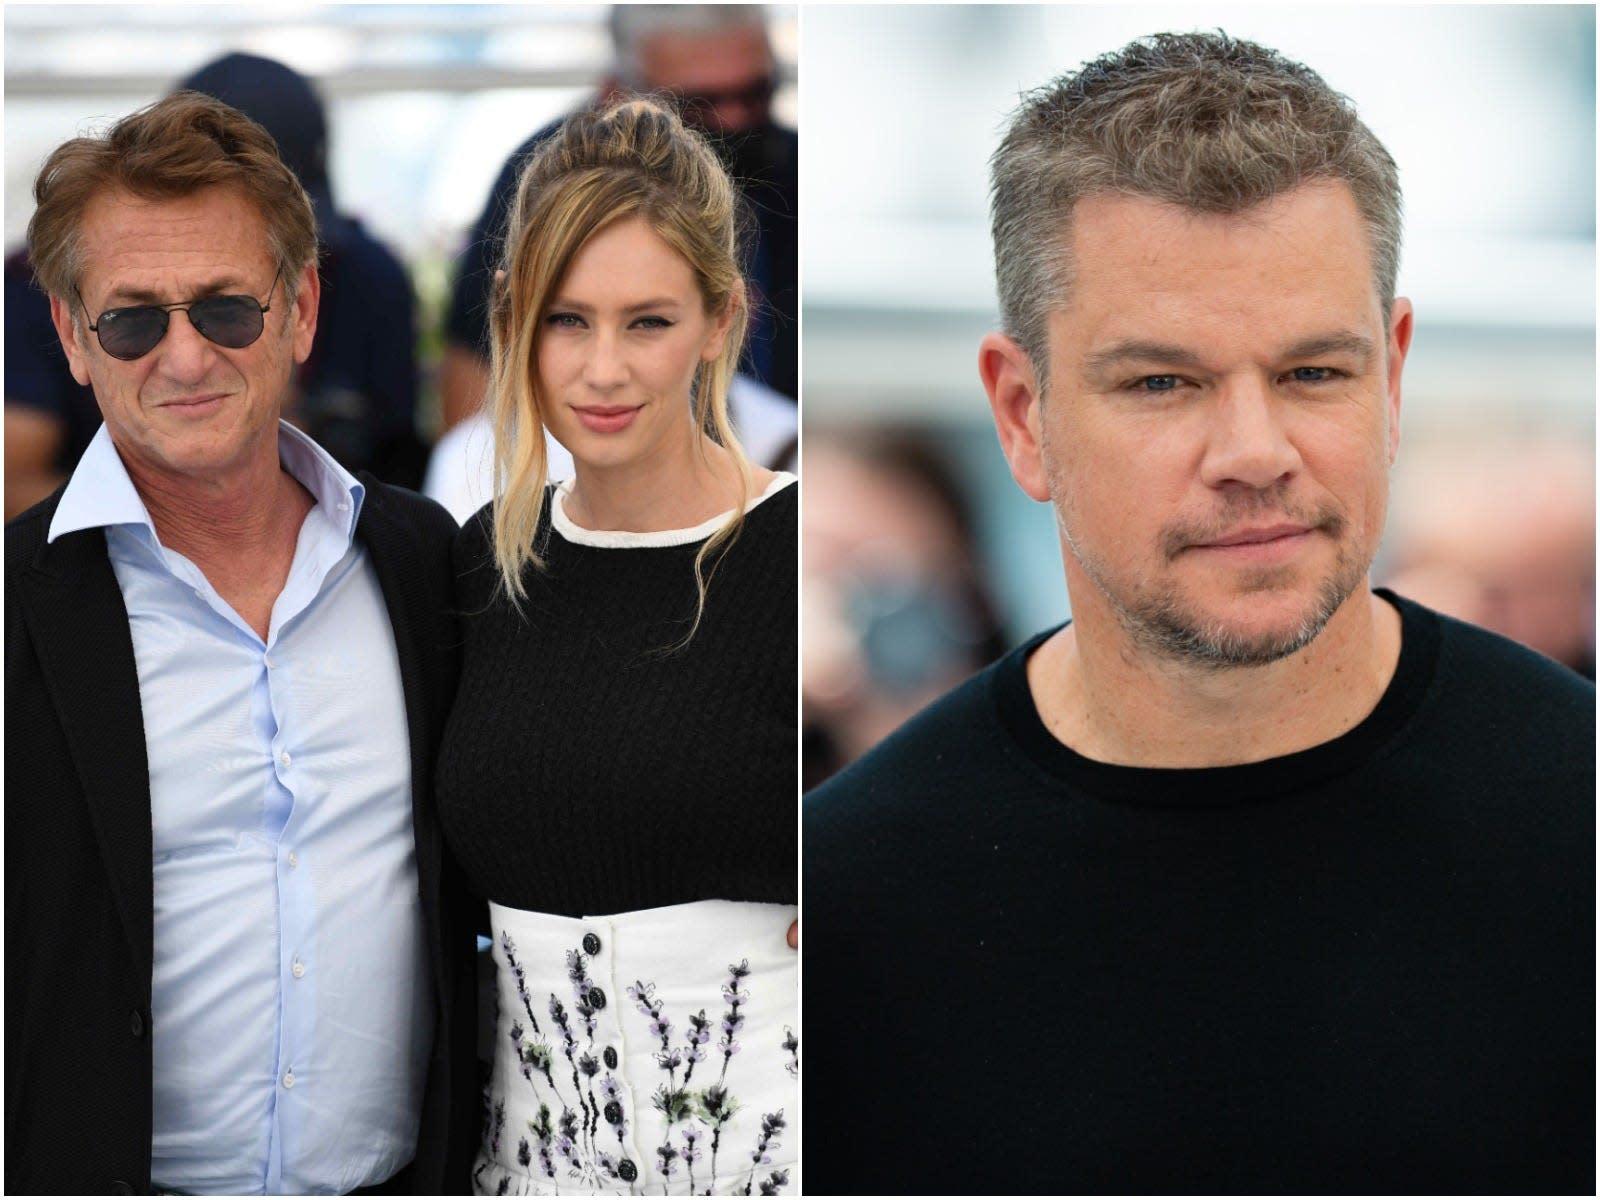 Sean Penn says Matt Damon calling him 'a stupid schmuck' convinced him to star opposite his daughter in new movie